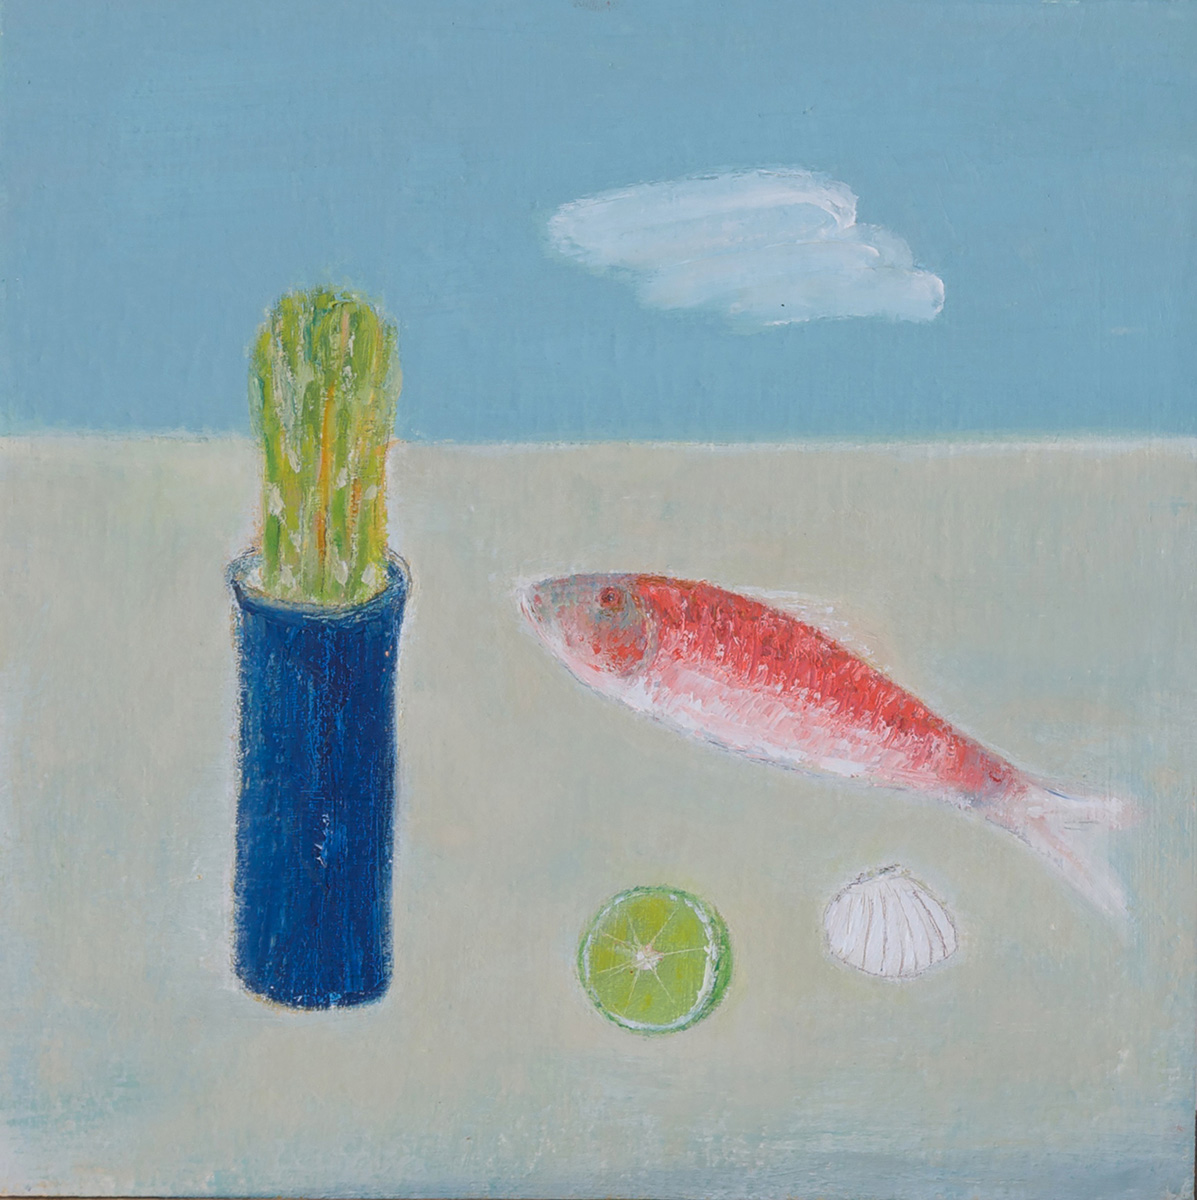 Fish & Lime